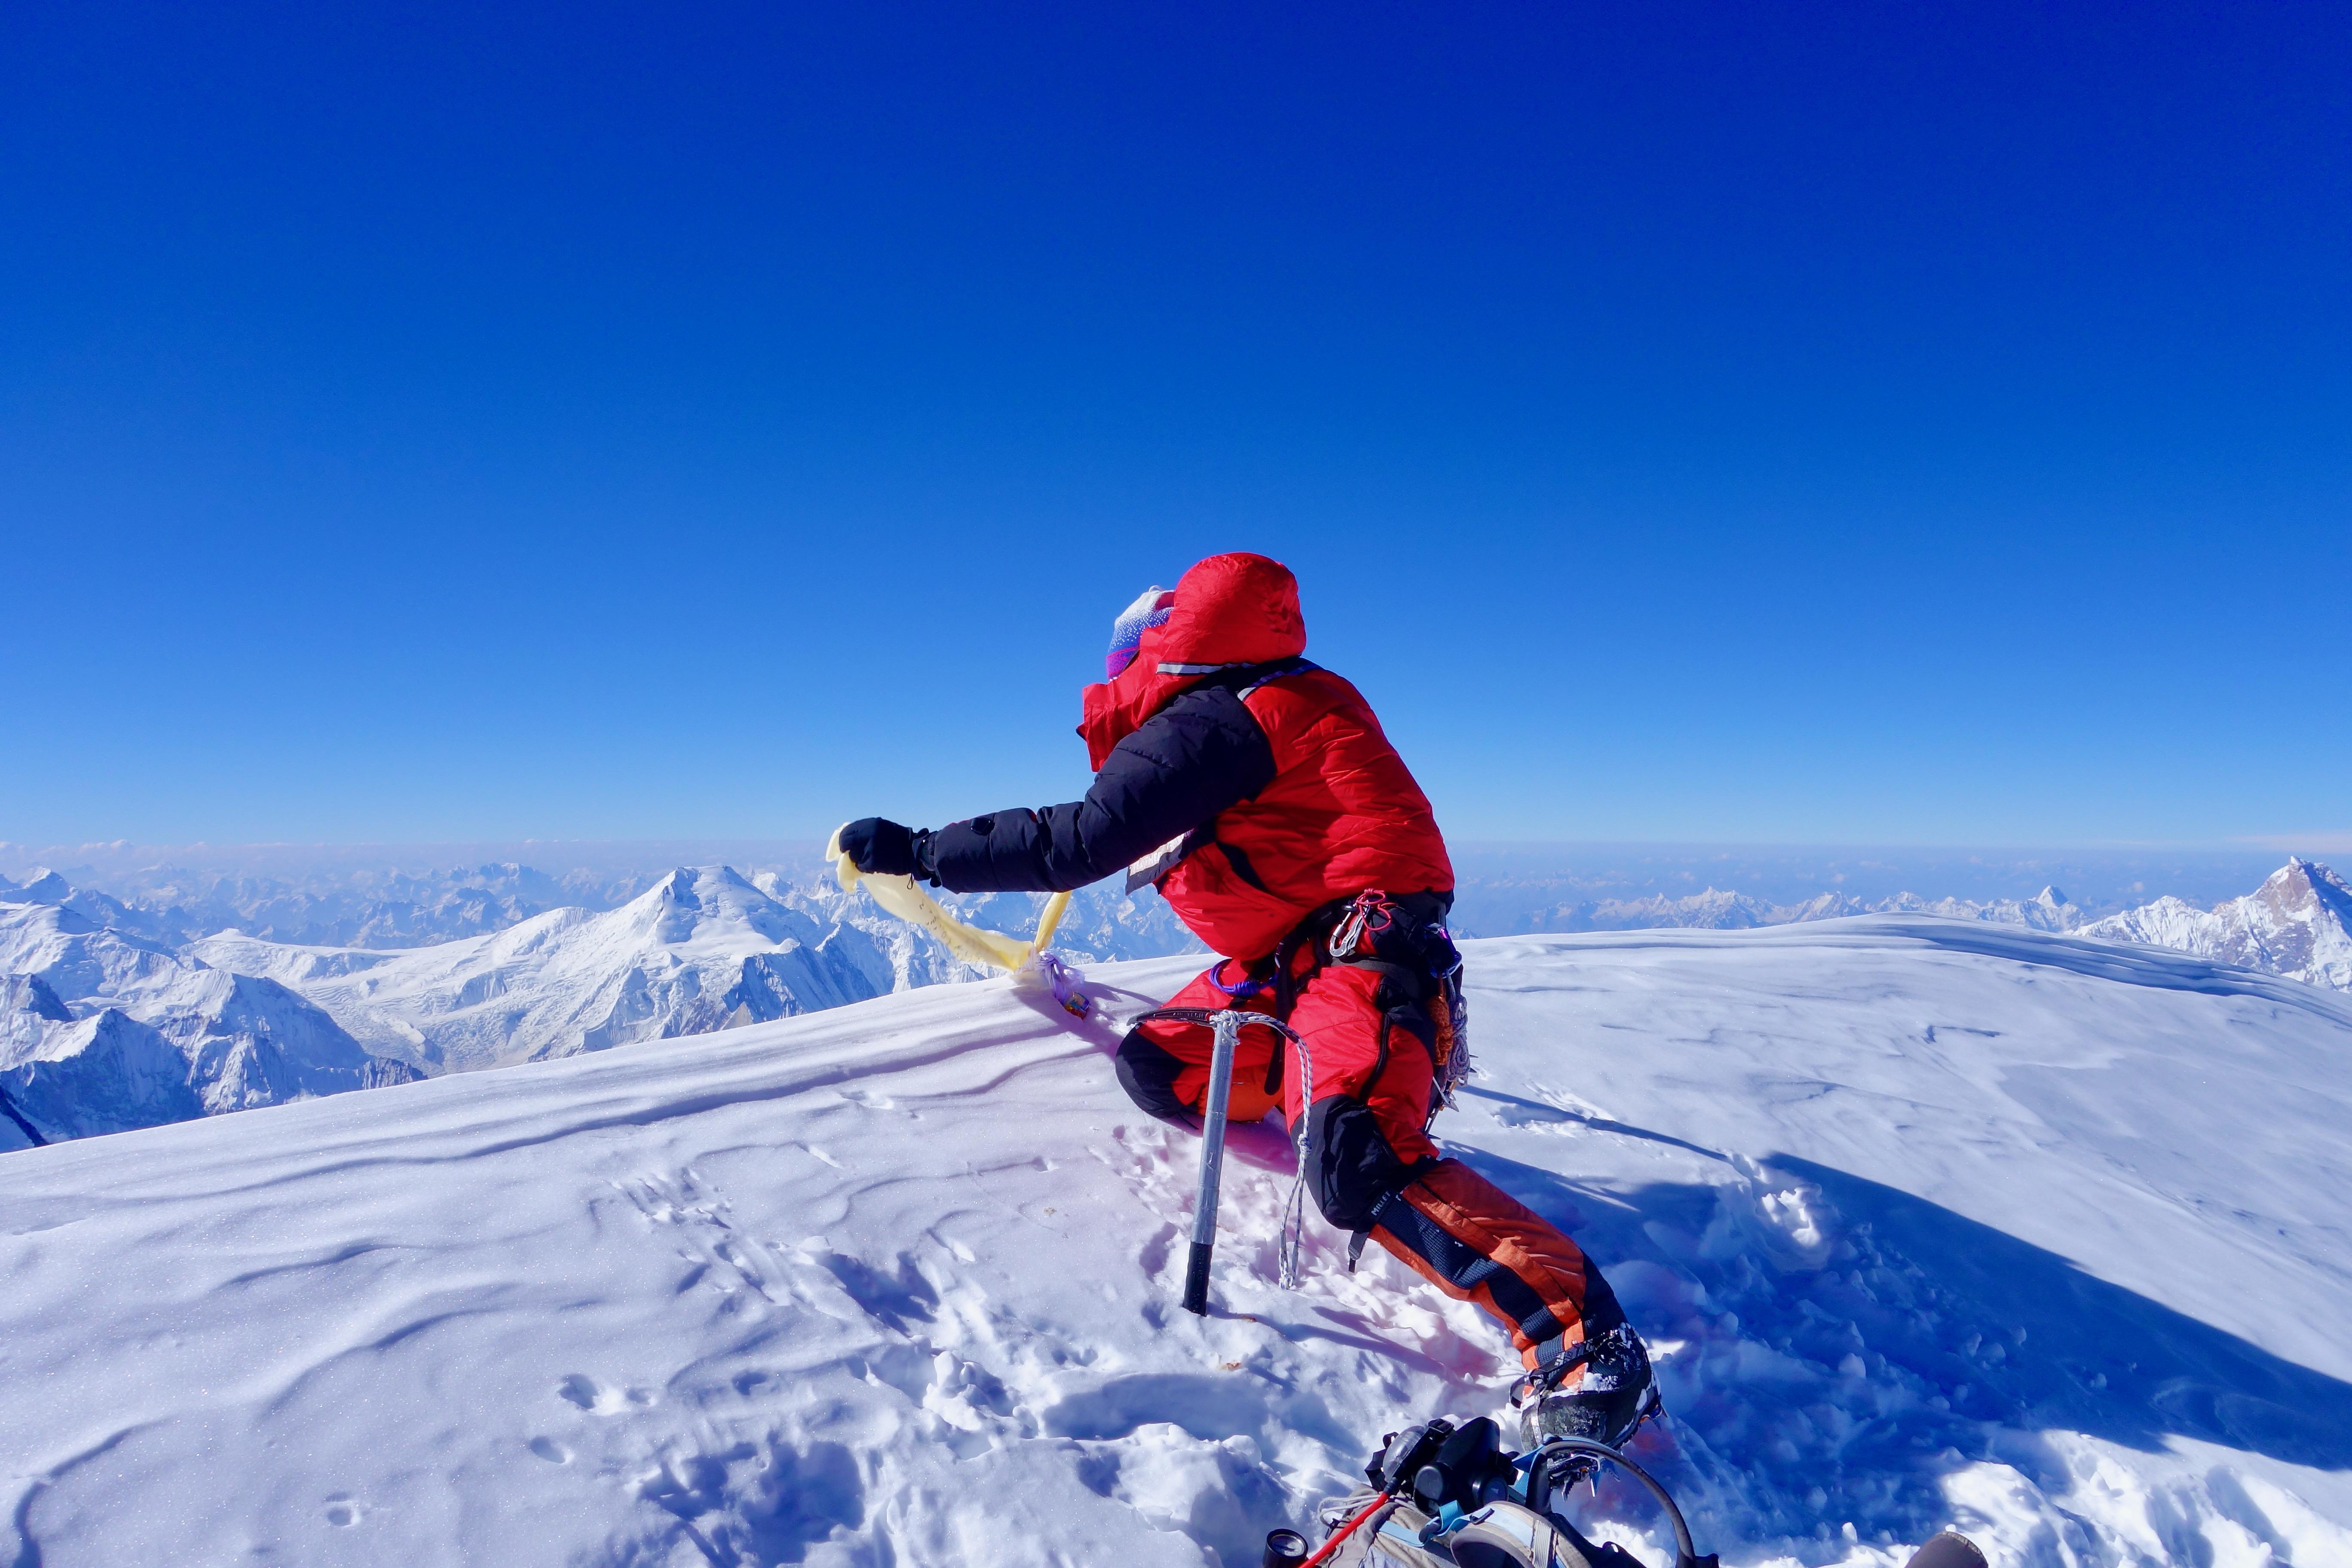 K2 Summit 2014 © www.alanarnette.com